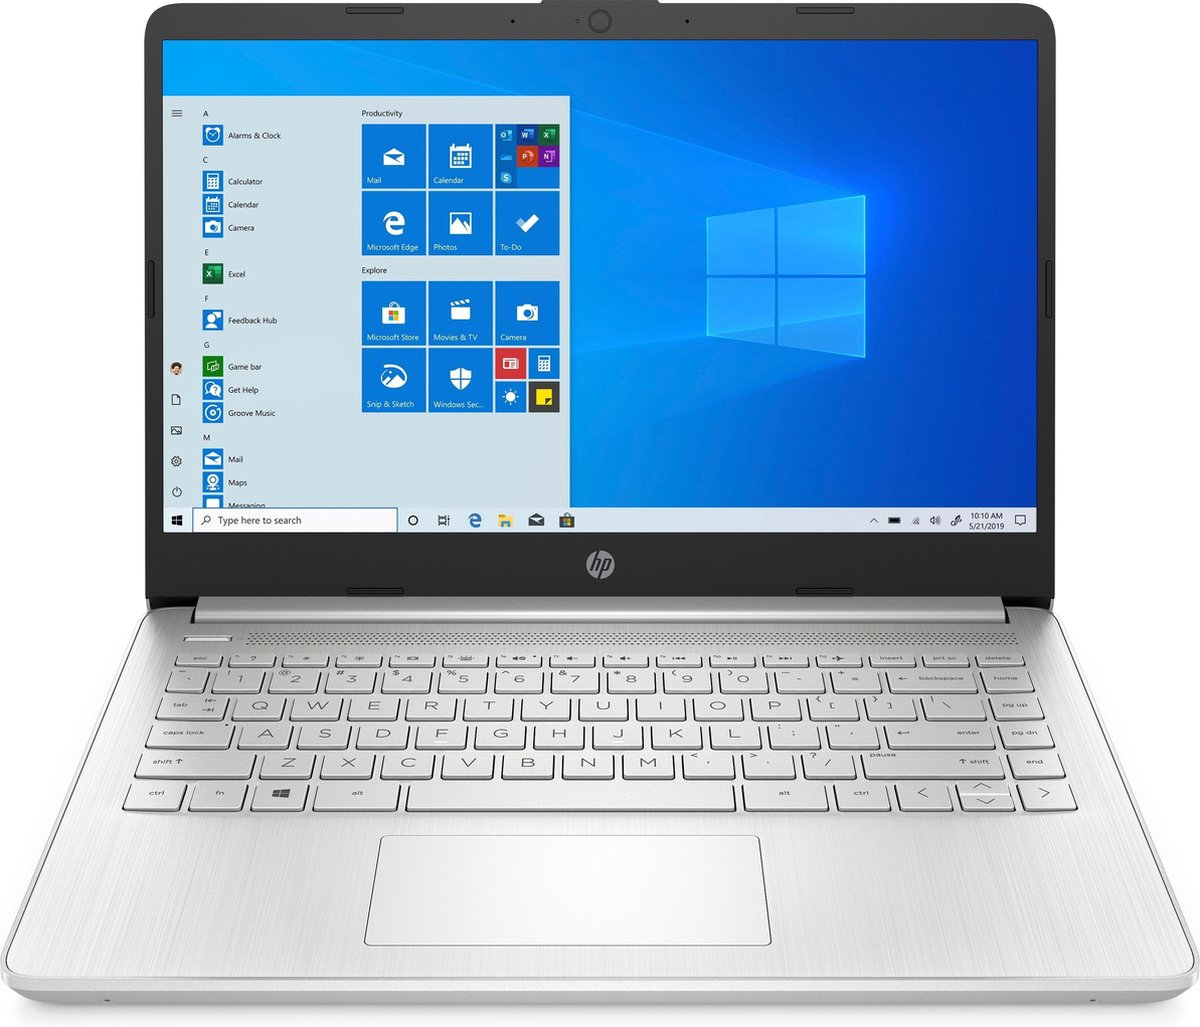 "HP 14s-fq0037nd DDR4-SDRAM Notebook 35,6 cm (14"") 1920 x 1080 Pixels AMD Ryzen 3 4 GB 128 GB SSD Wi-Fi 5 (802.11ac) Windows 10 Home S Zilver"